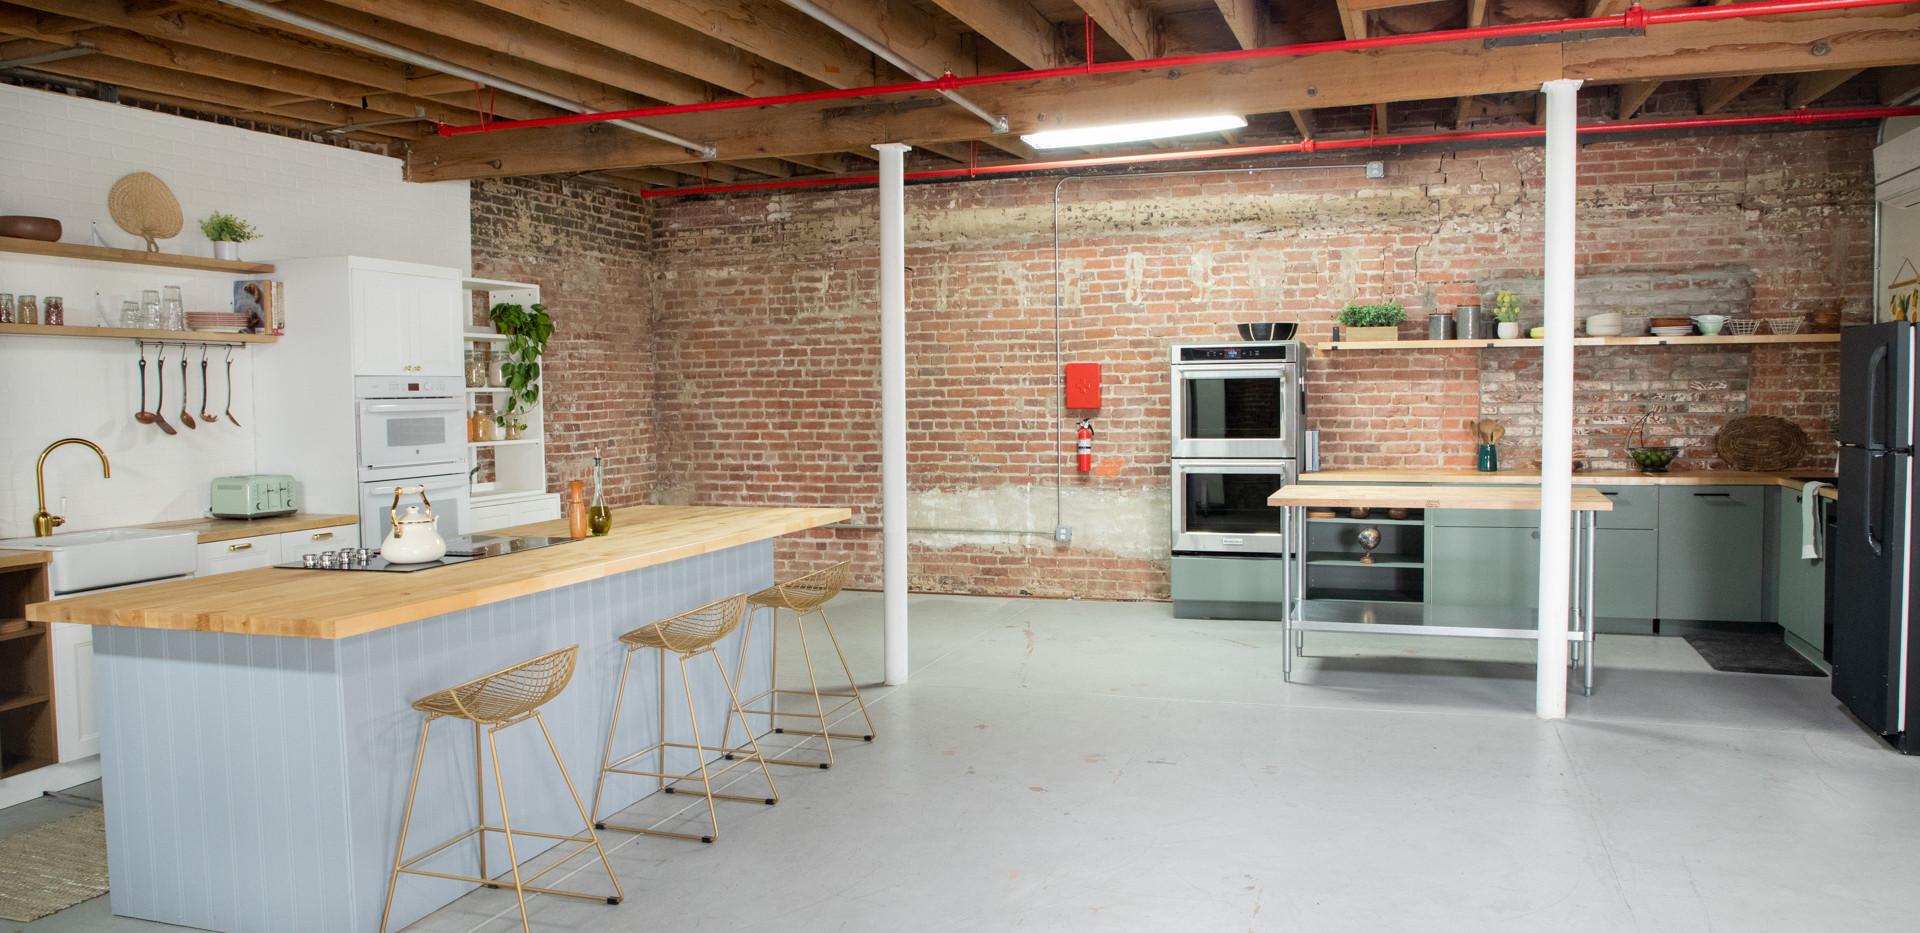 Jikoni Studios Kitchen Studio Rental_2 K